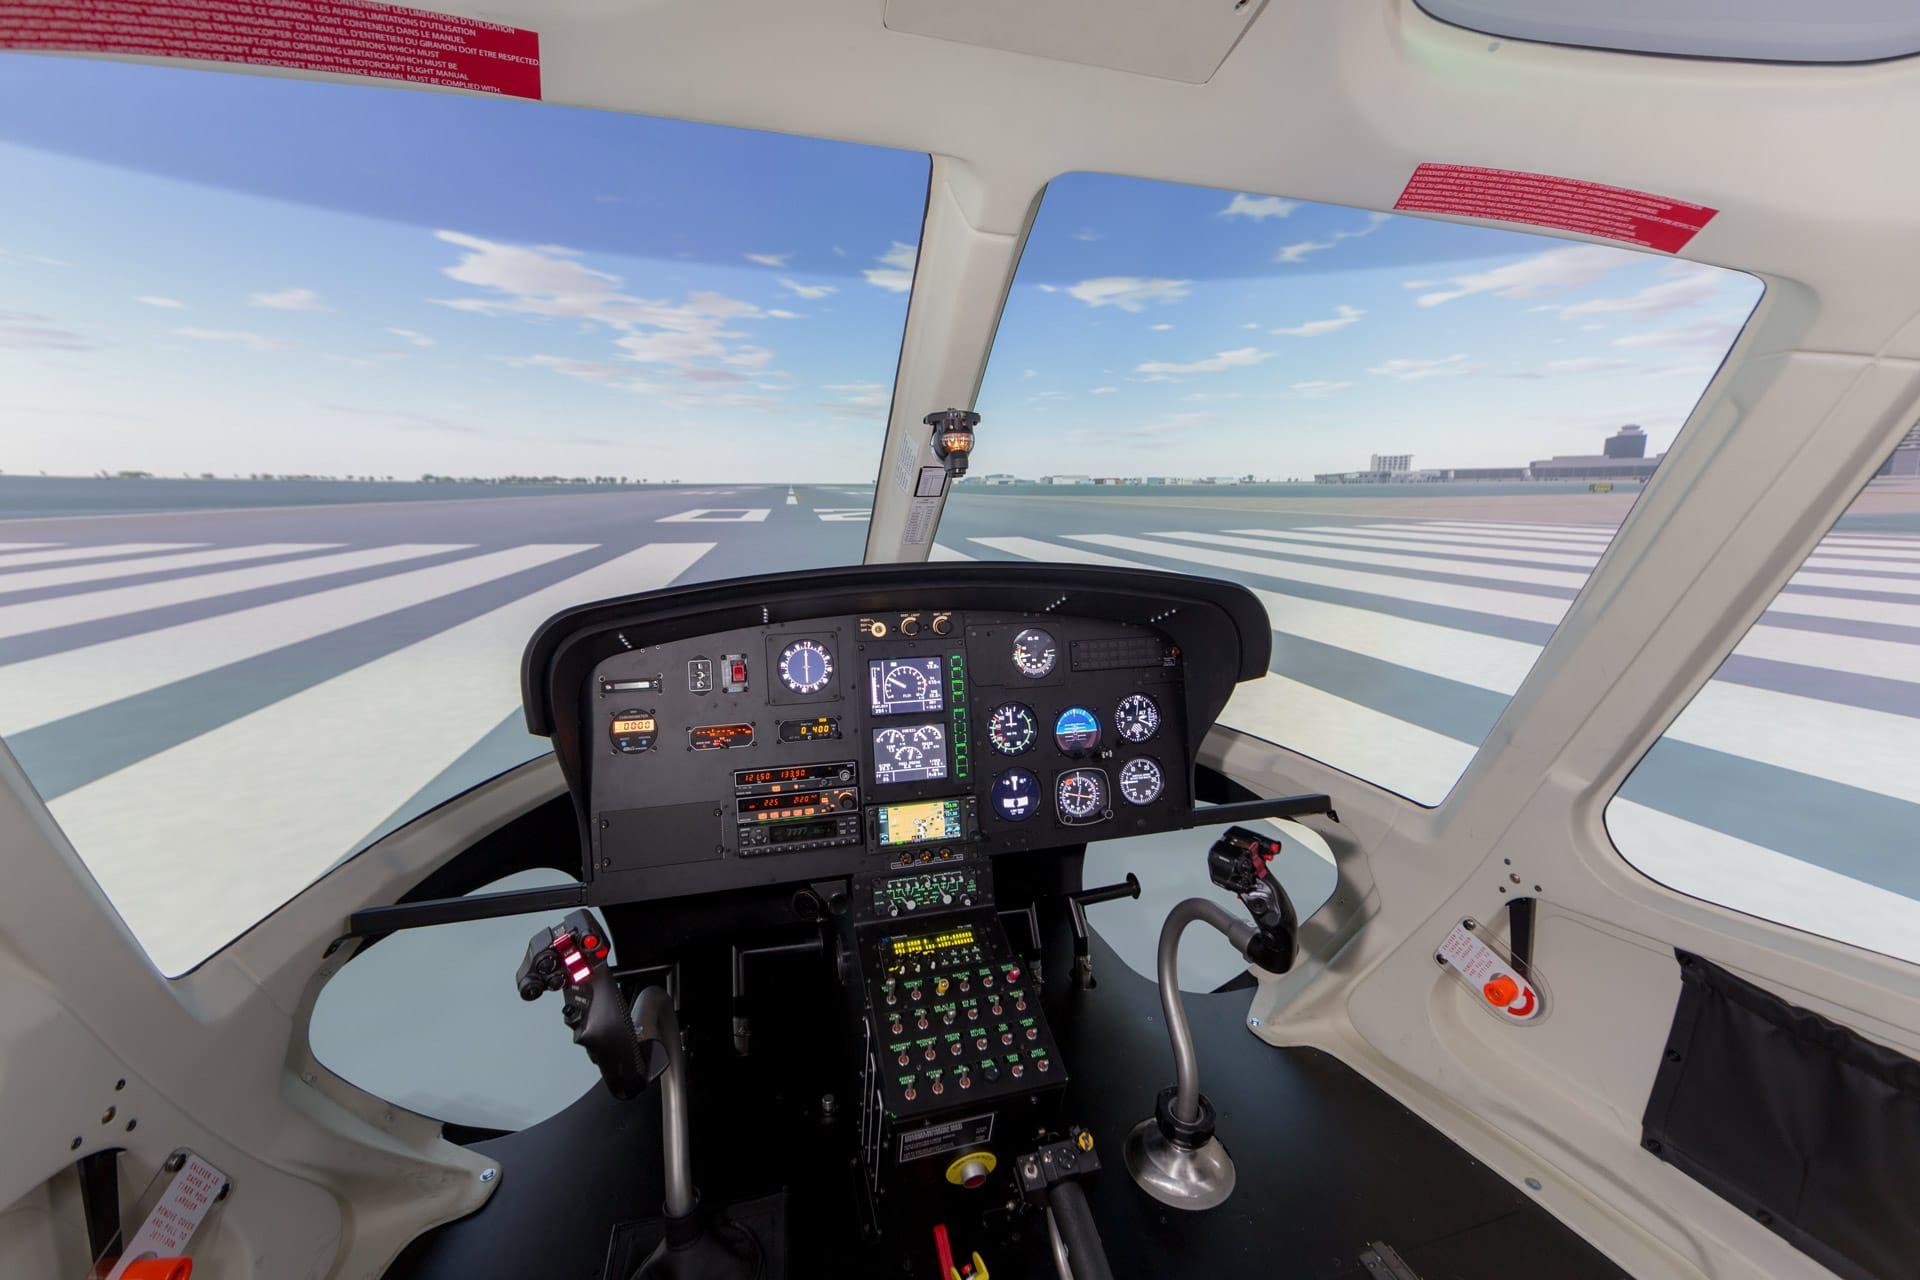 Airbus AS350 B3e H125 Simulator - Frasca Flight Simulation